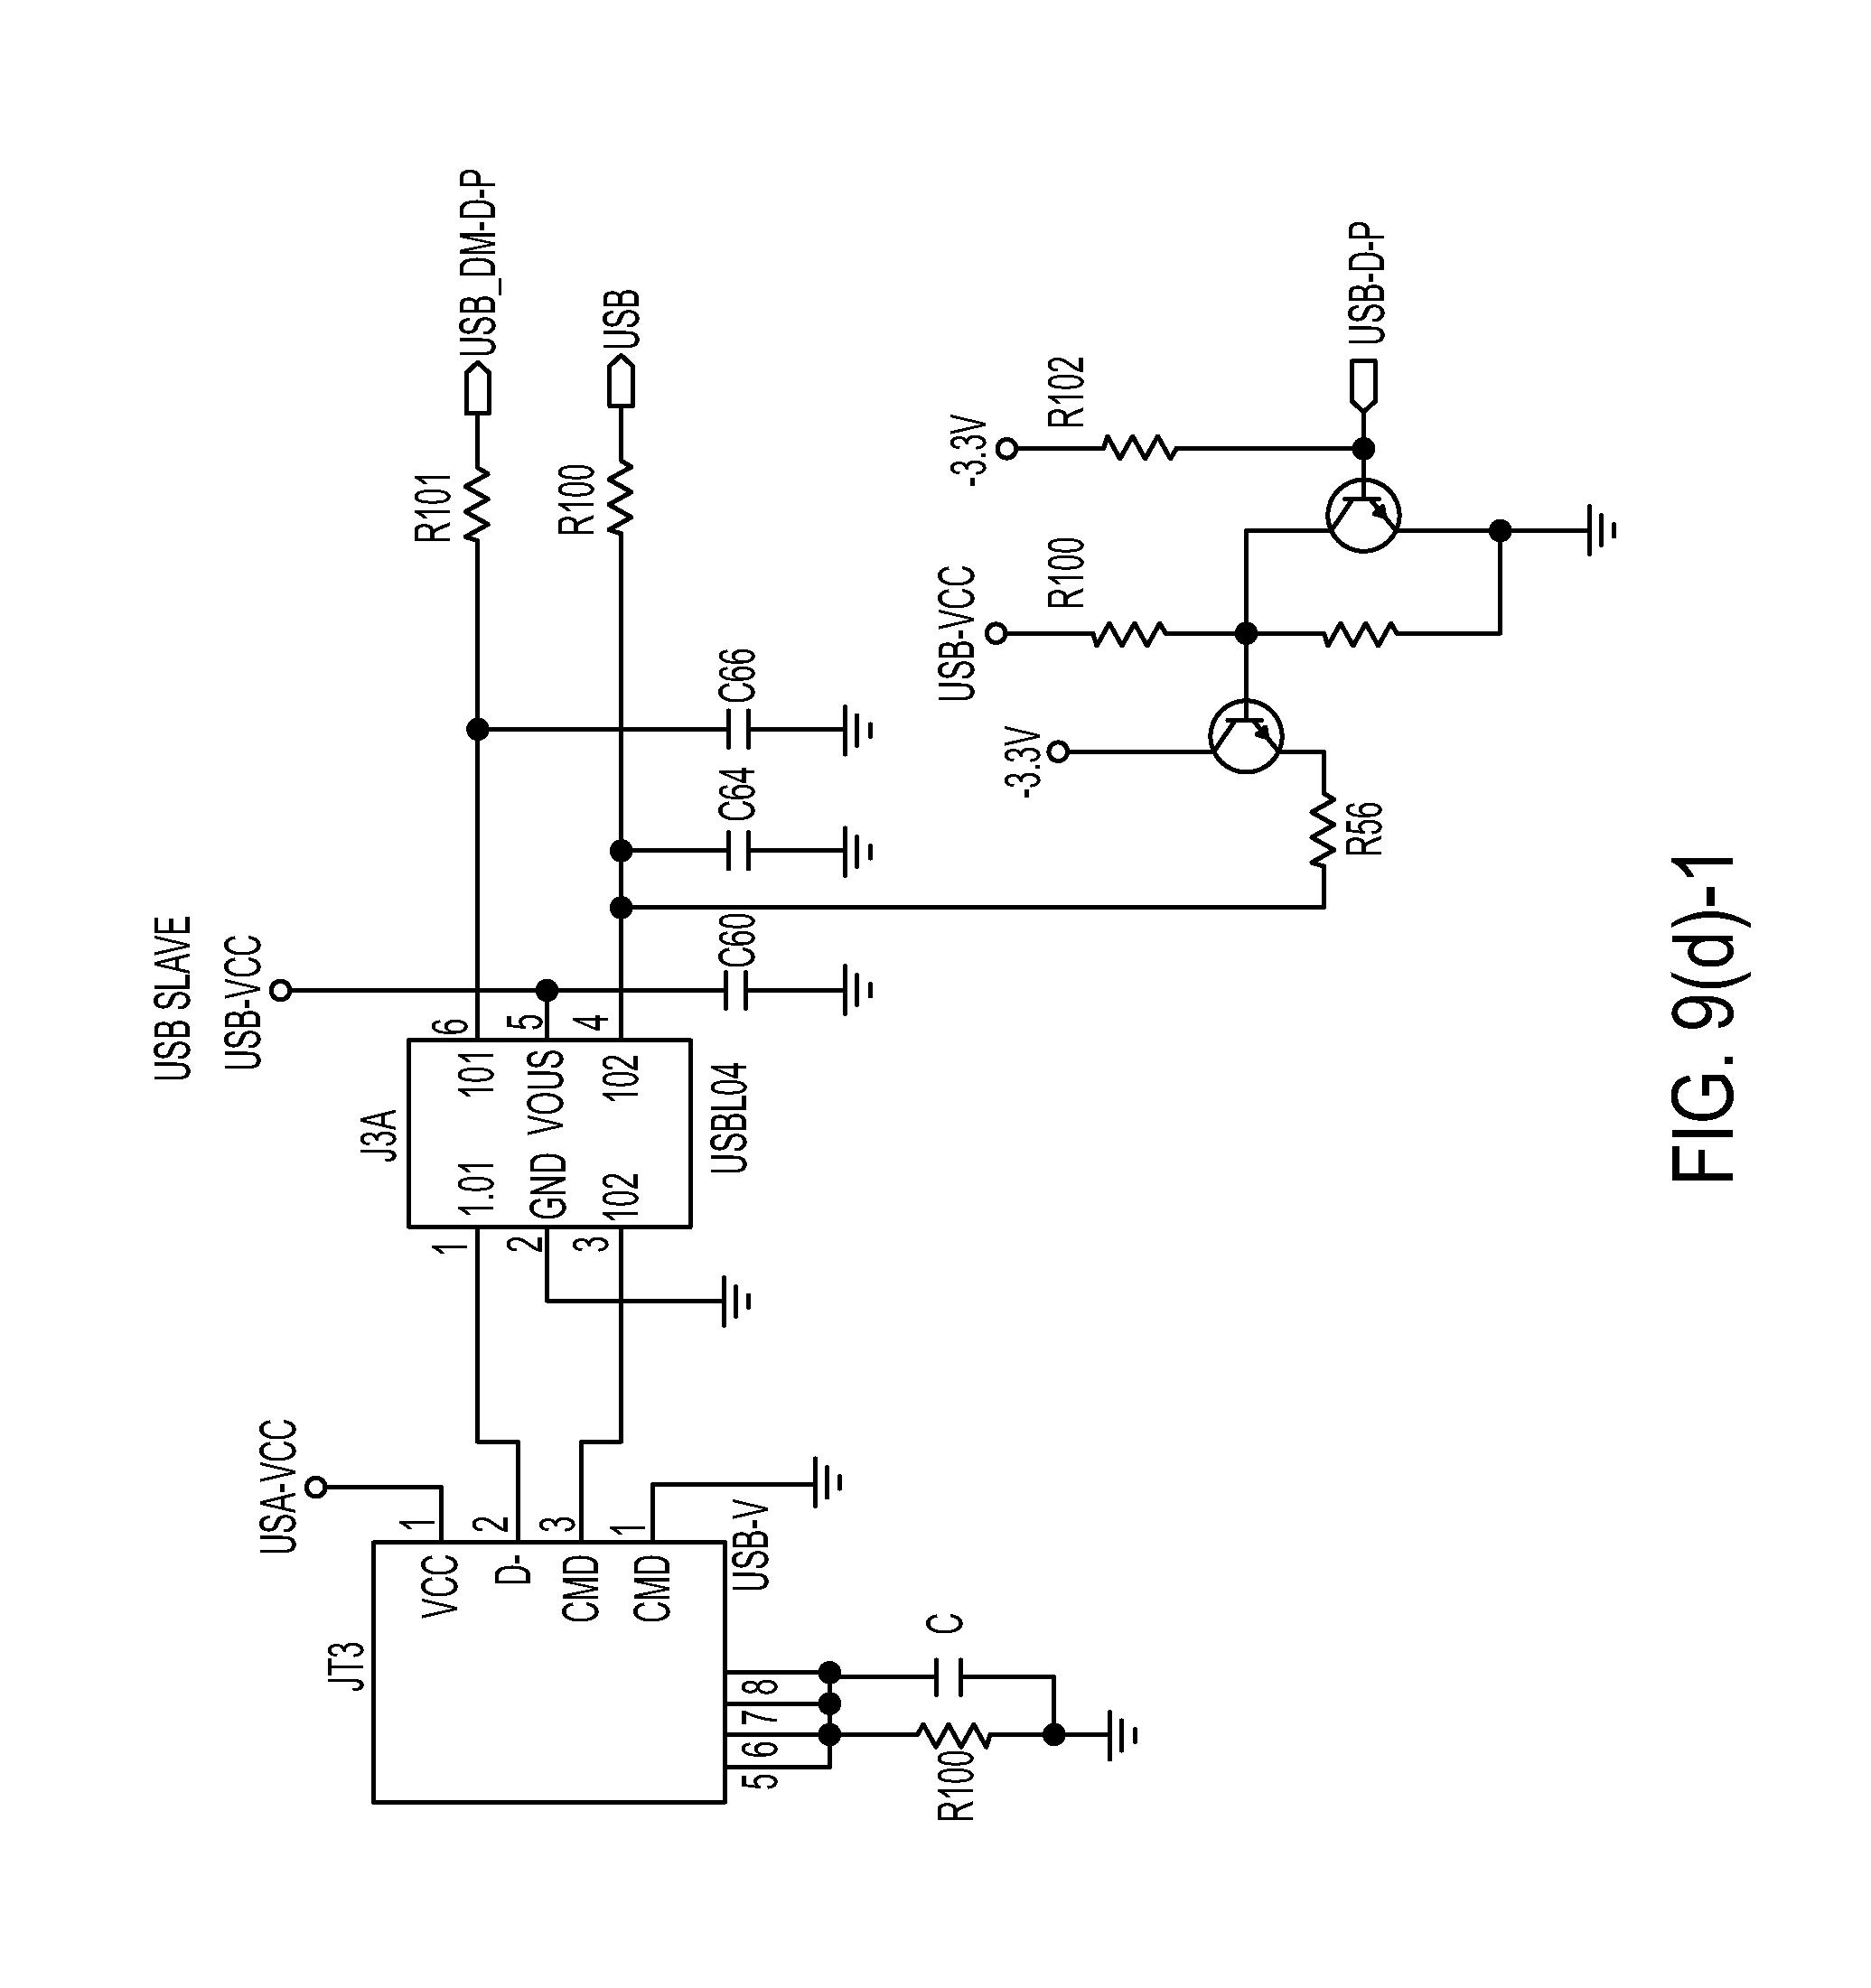 Royce Thompson Photocell Wiring Diagram : 39 Wiring